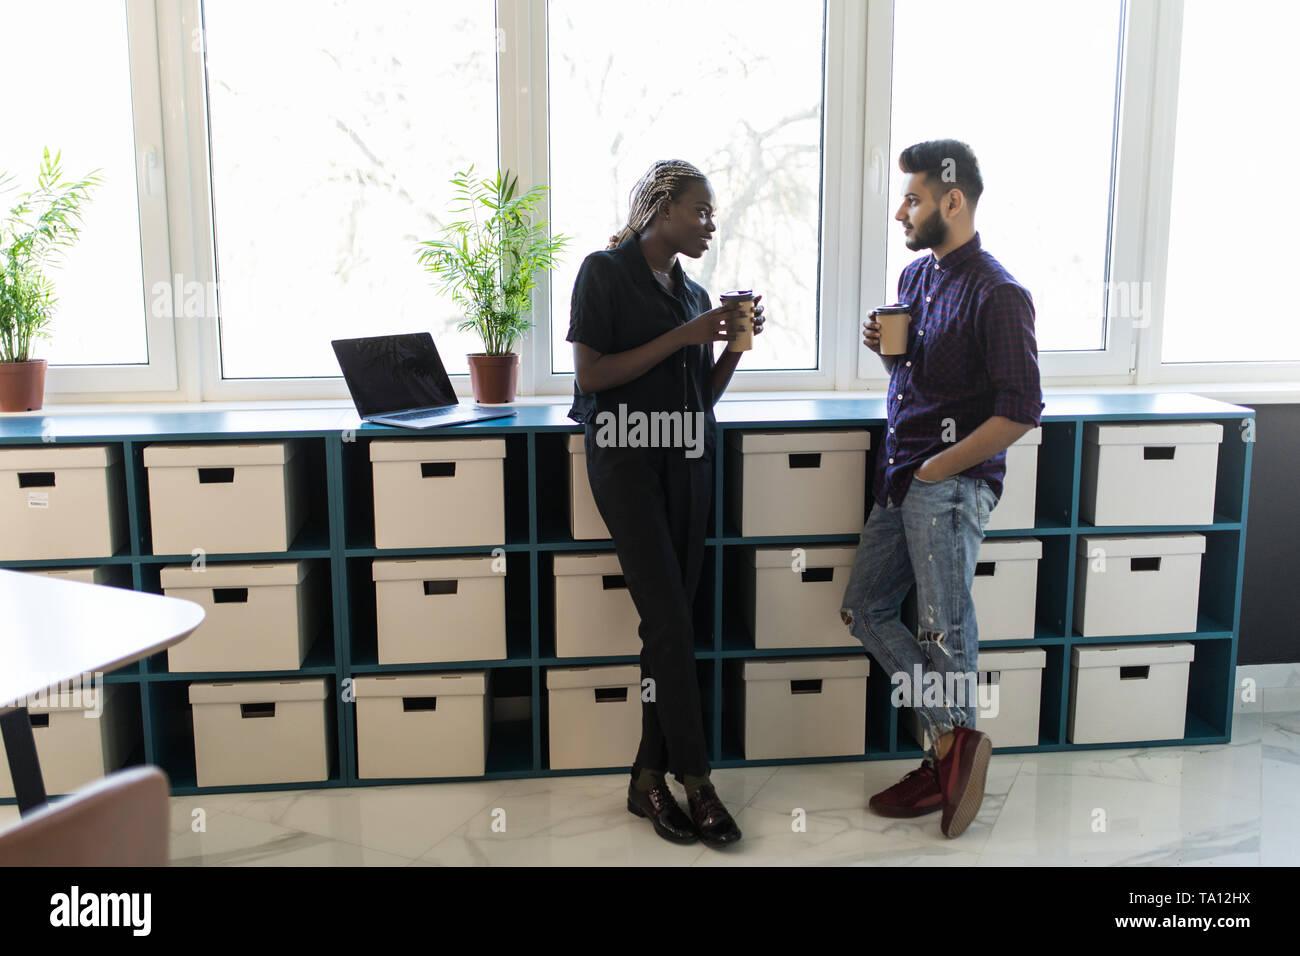 Arbeitskollegen in die Kaffeepause im Büro Stockfoto